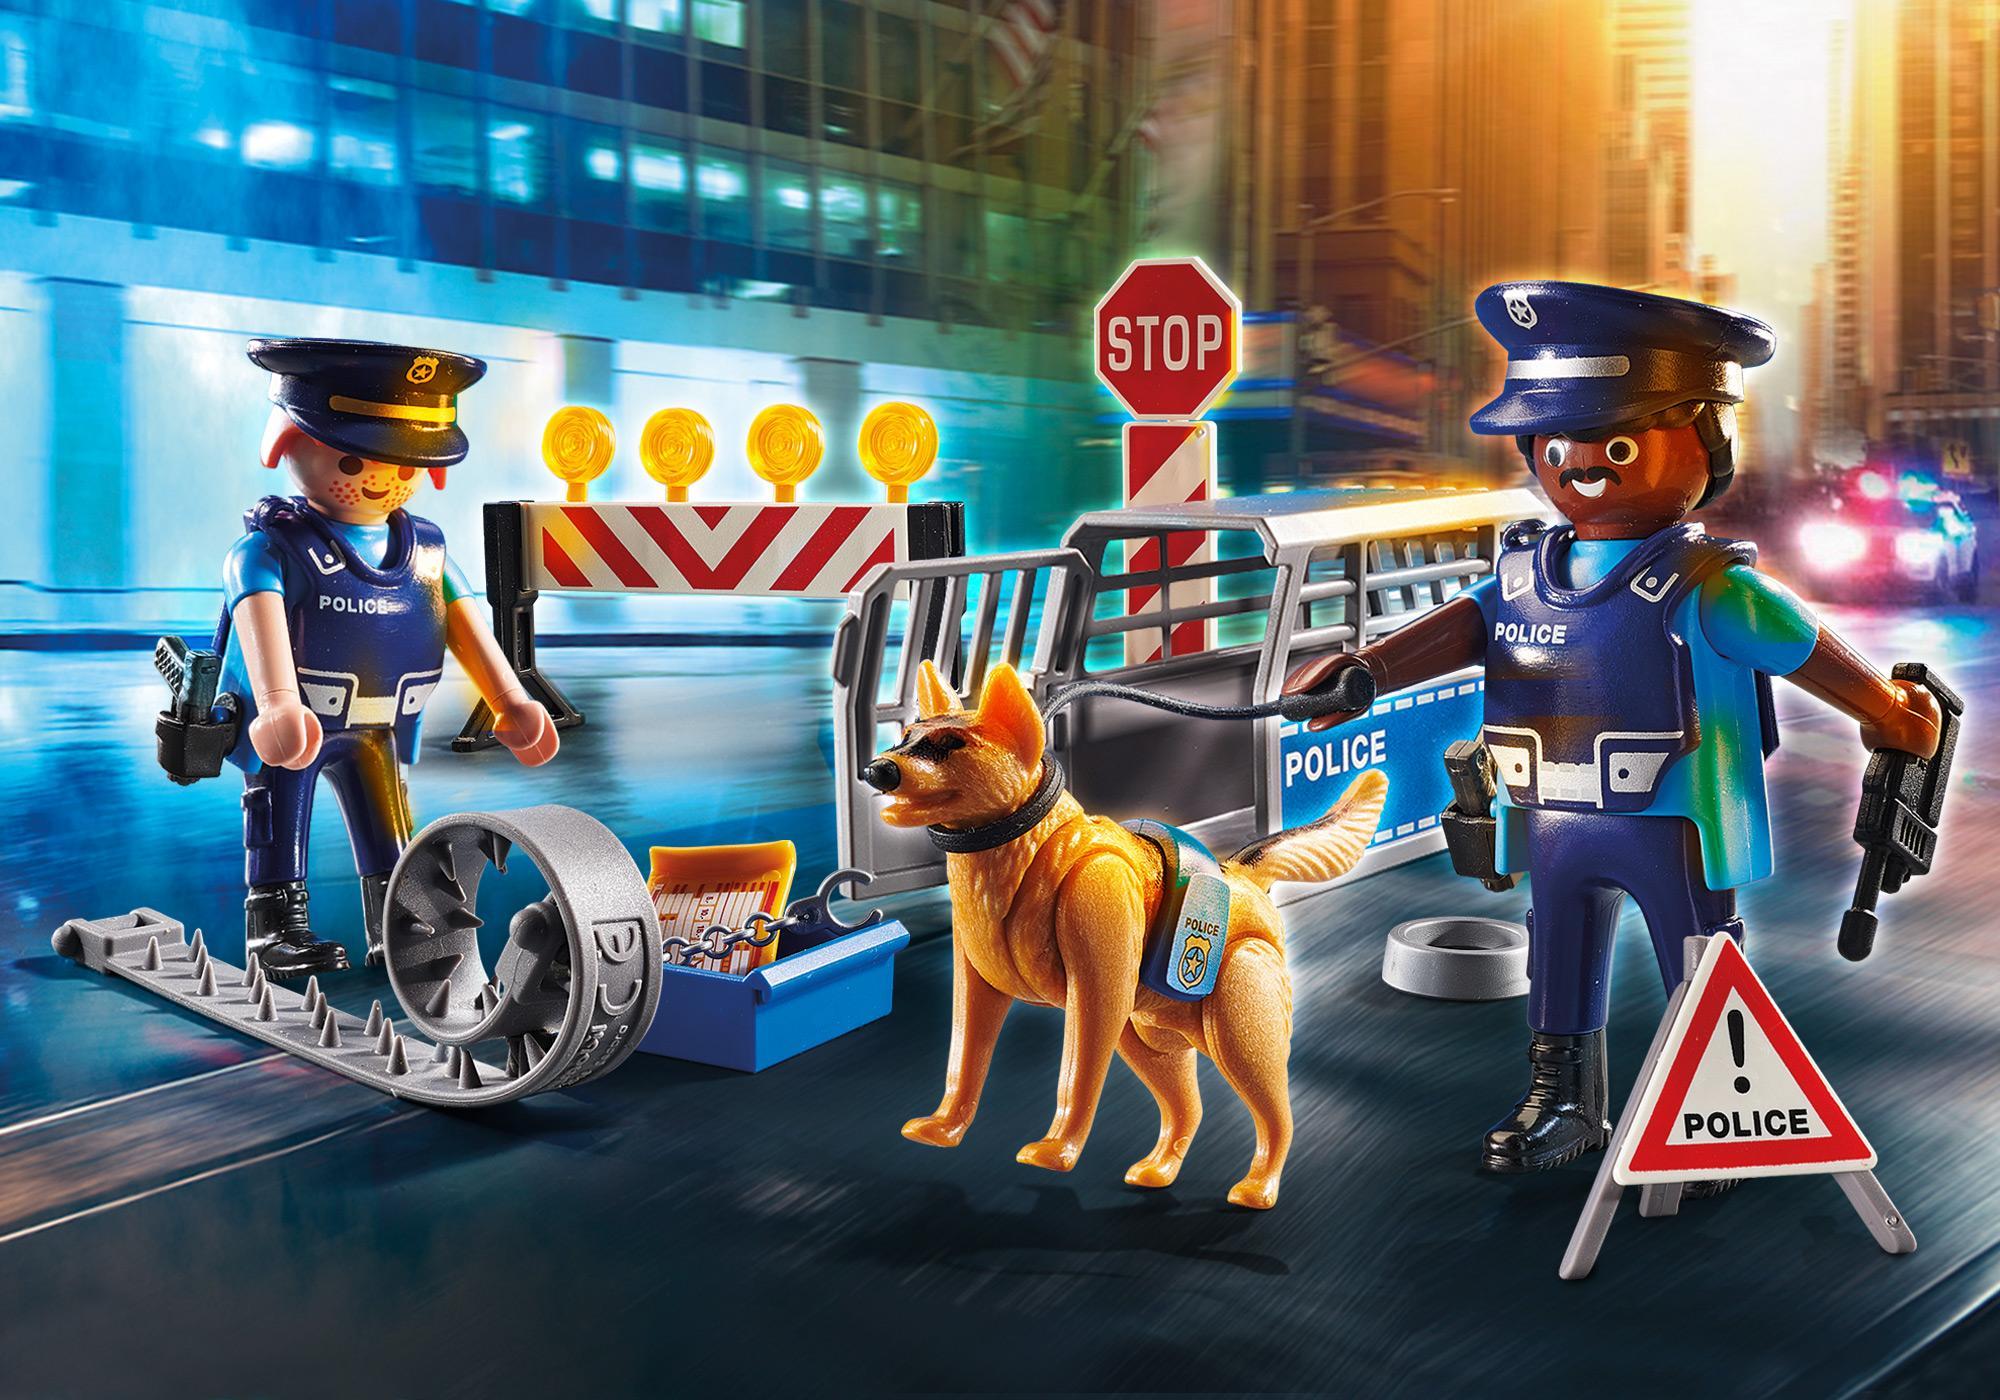 http://media.playmobil.com/i/playmobil/6924_product_detail/Police Roadblock